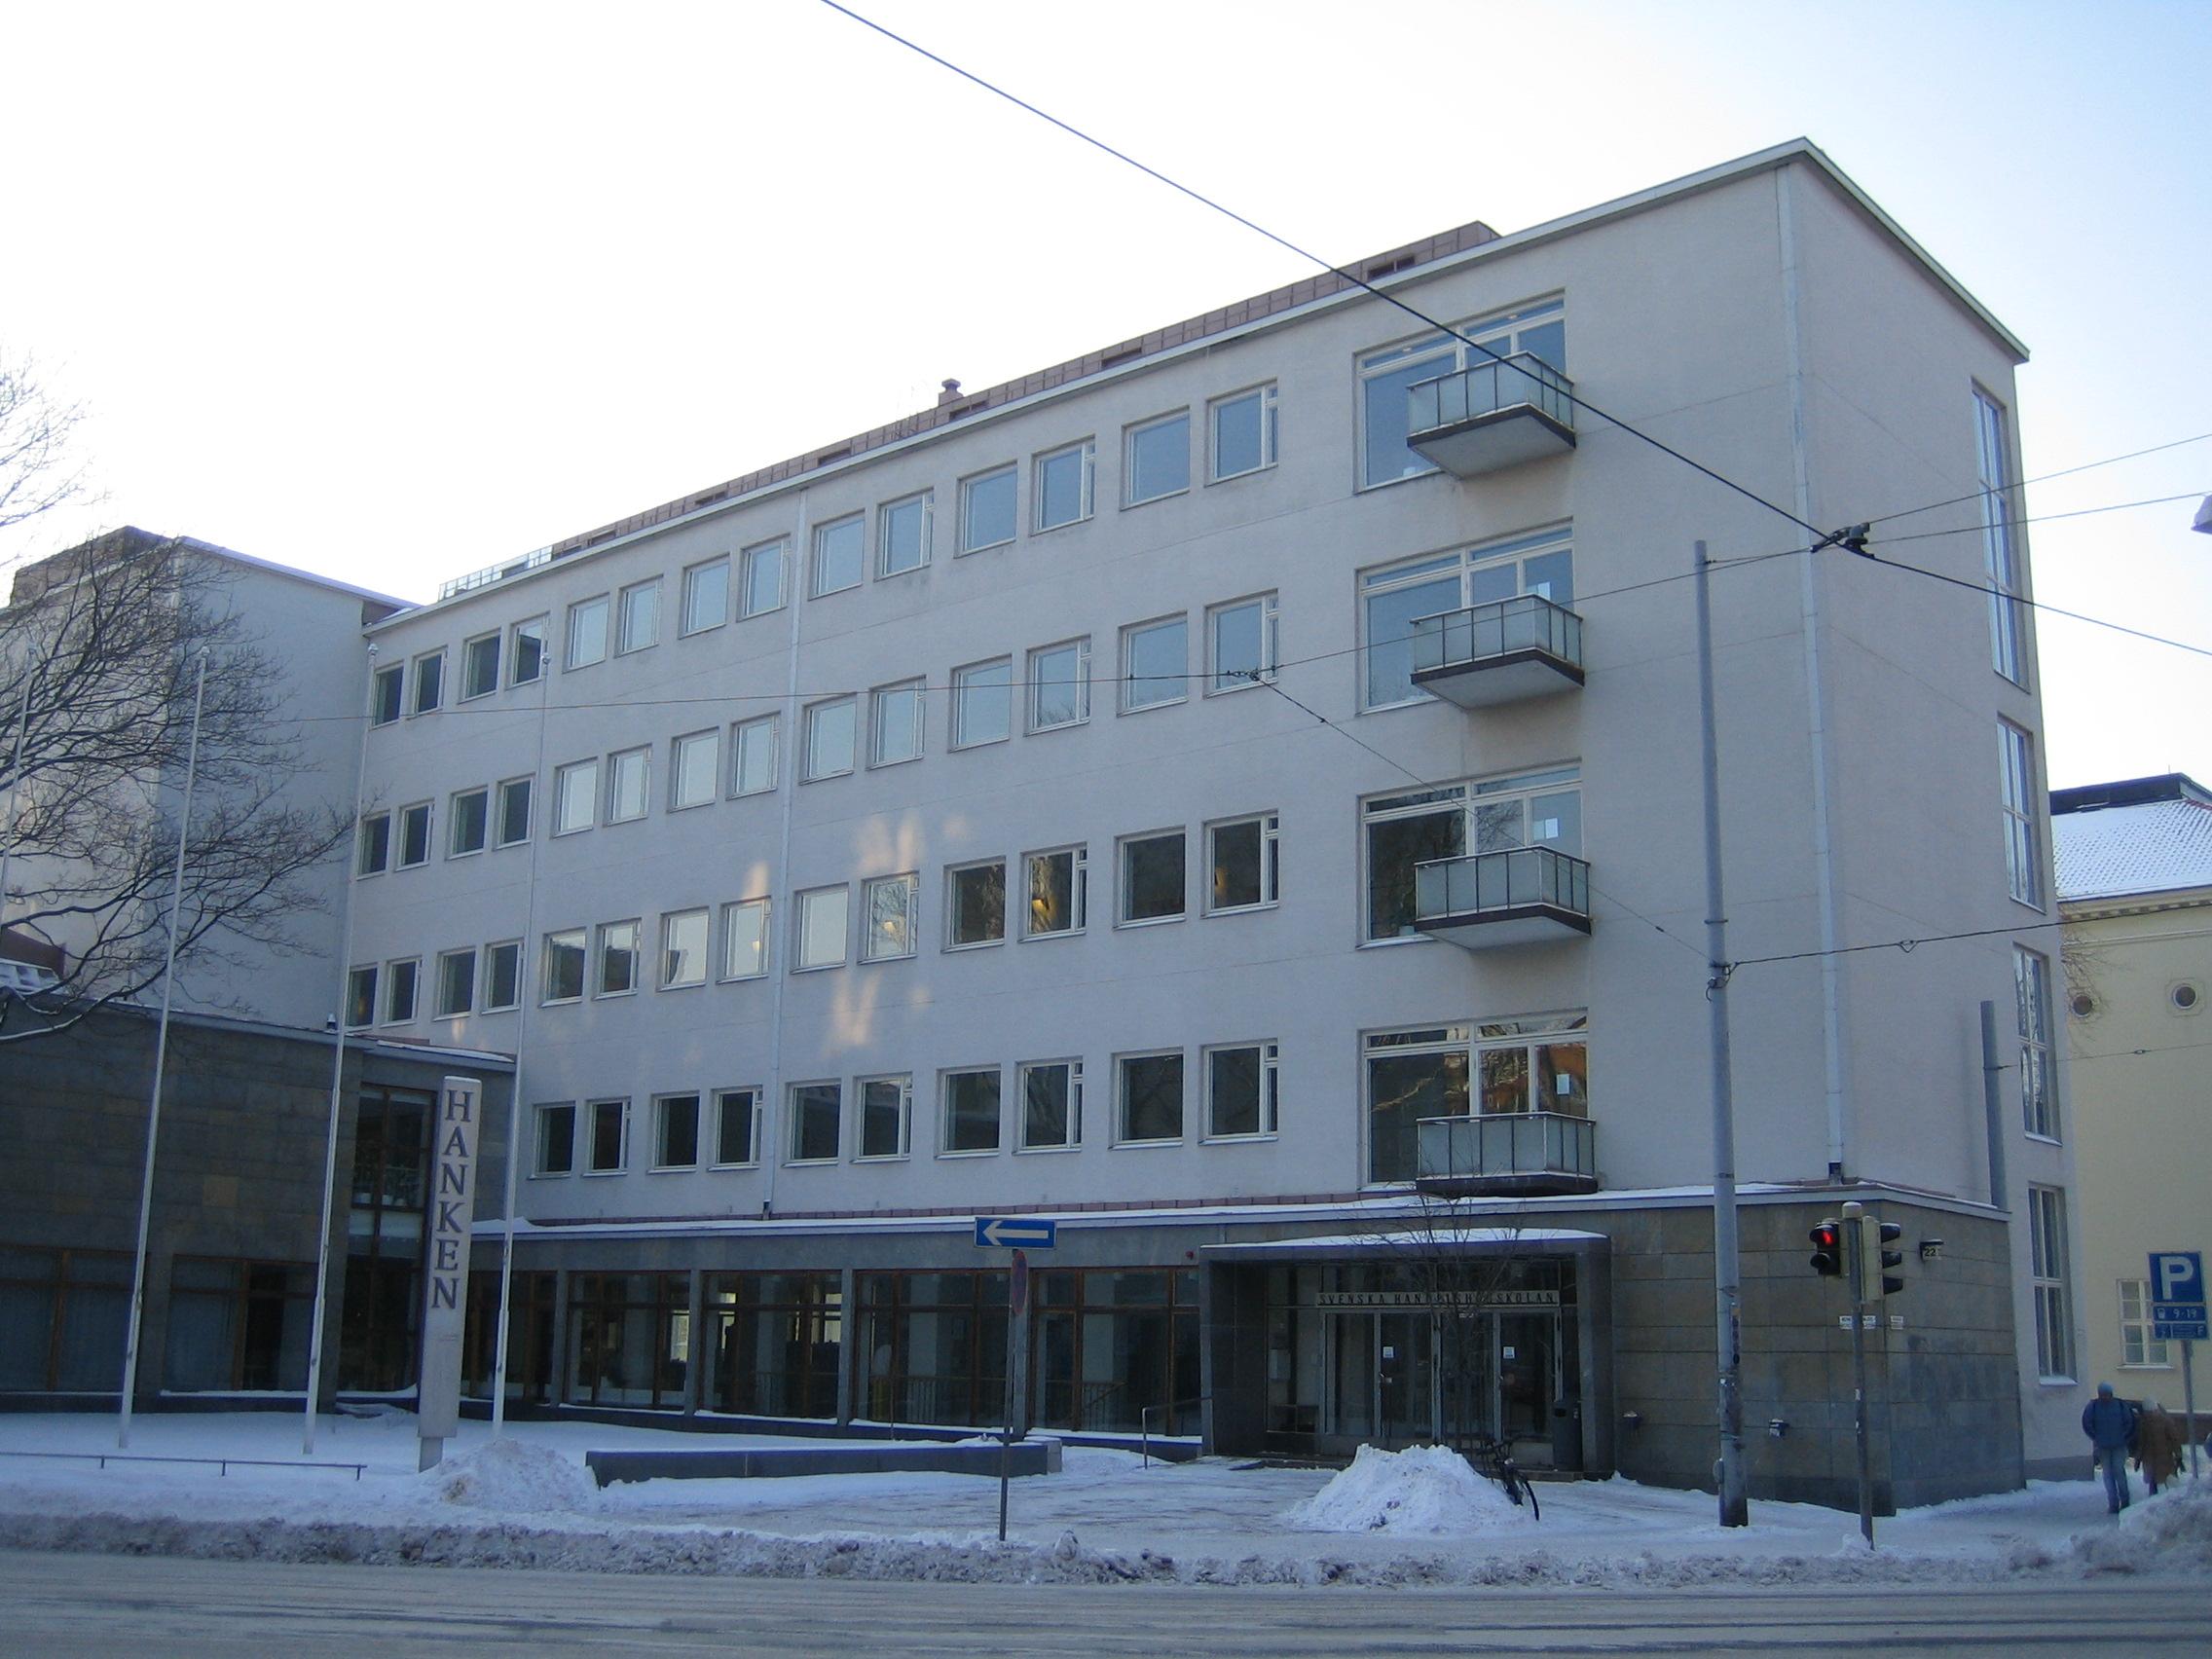 File:Hanken.jpg - Wikimedia Commons